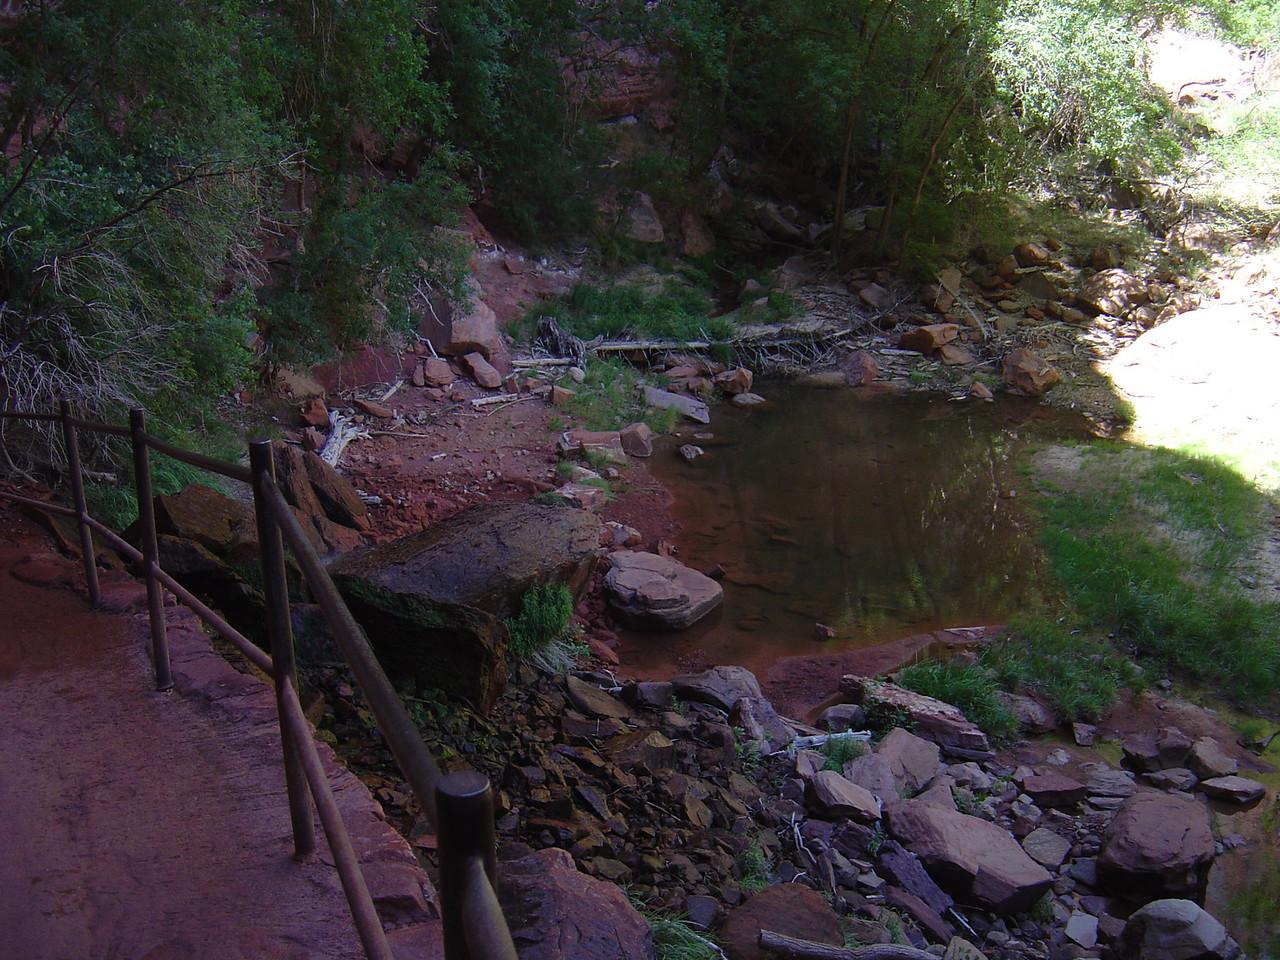 lower emeral pool